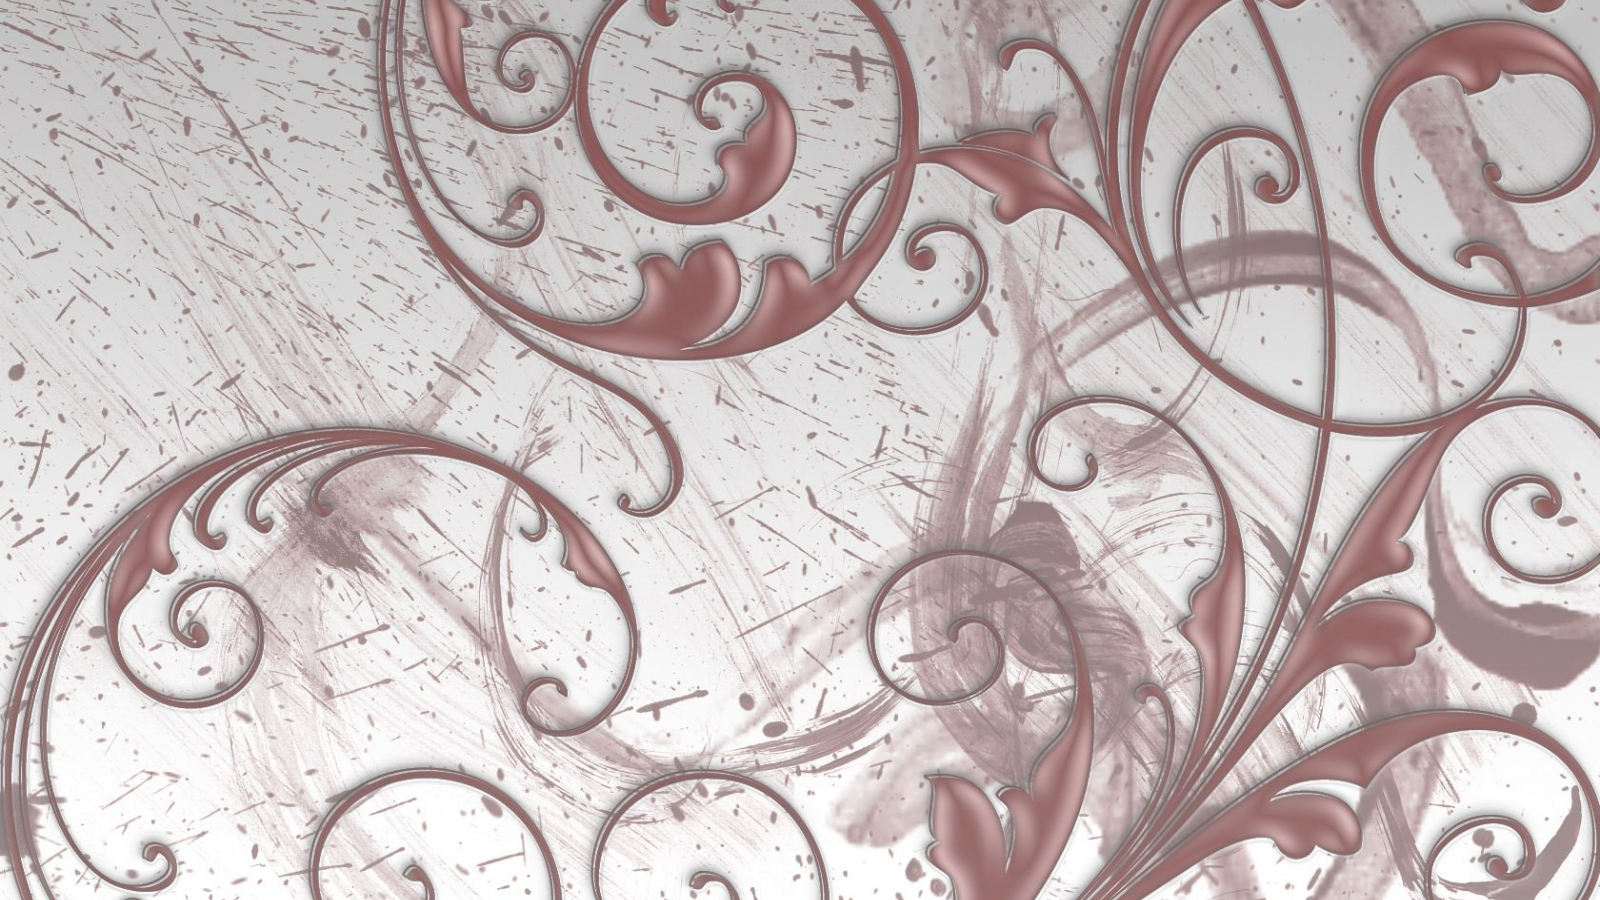 Free Download Art Nouveau Wallpapers Hd Resolution For Desktop